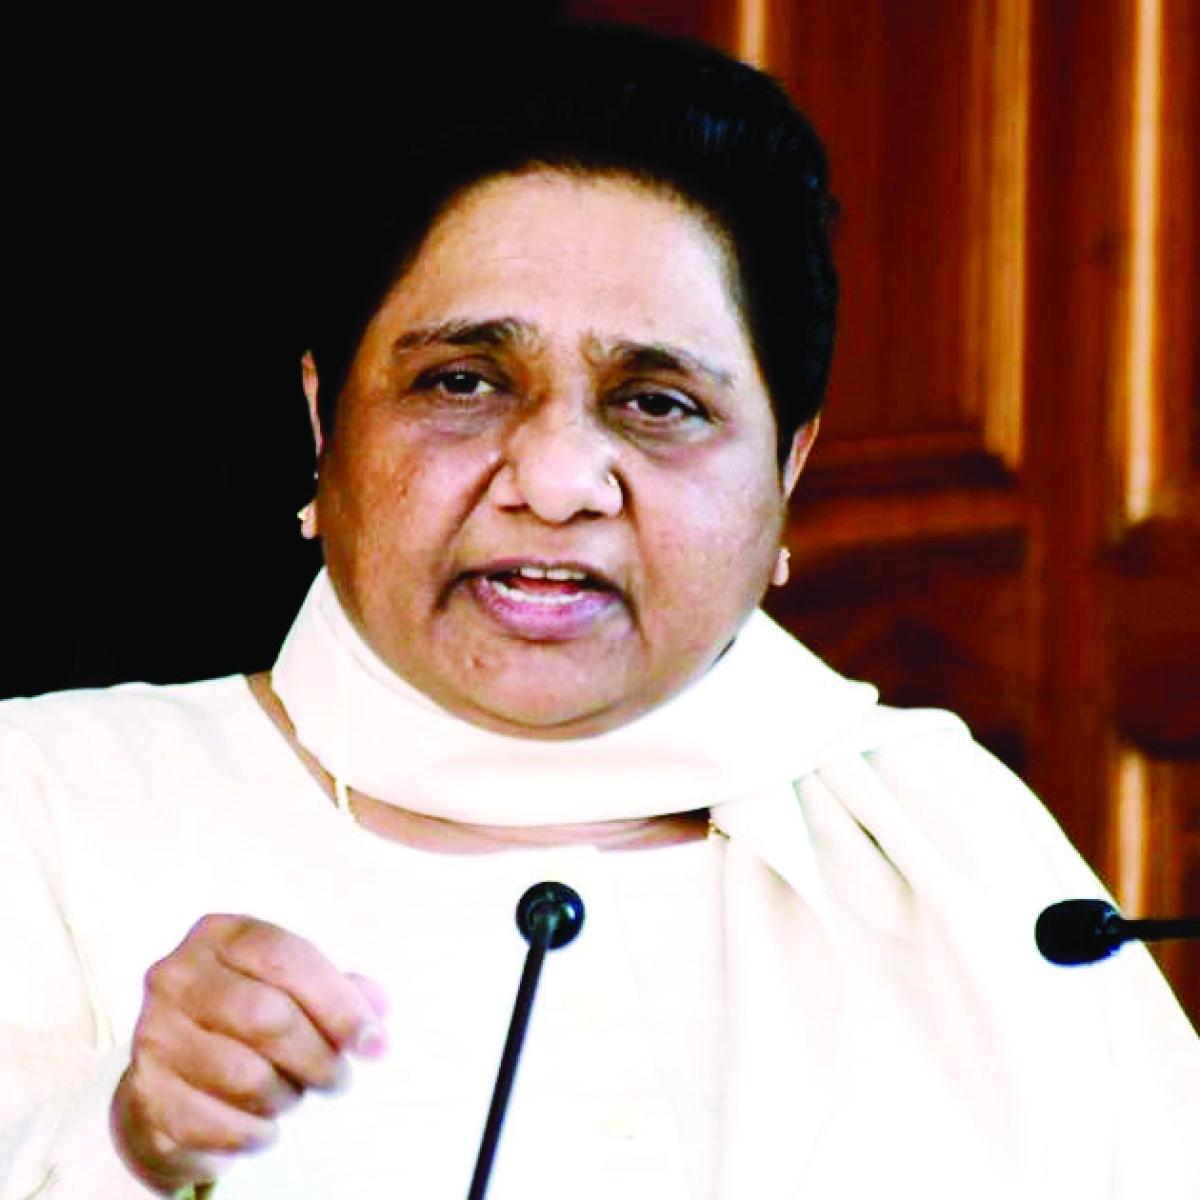 Mayawati's core Jatav voter base leans towards Congress in Agra and Fatehpur Sikri